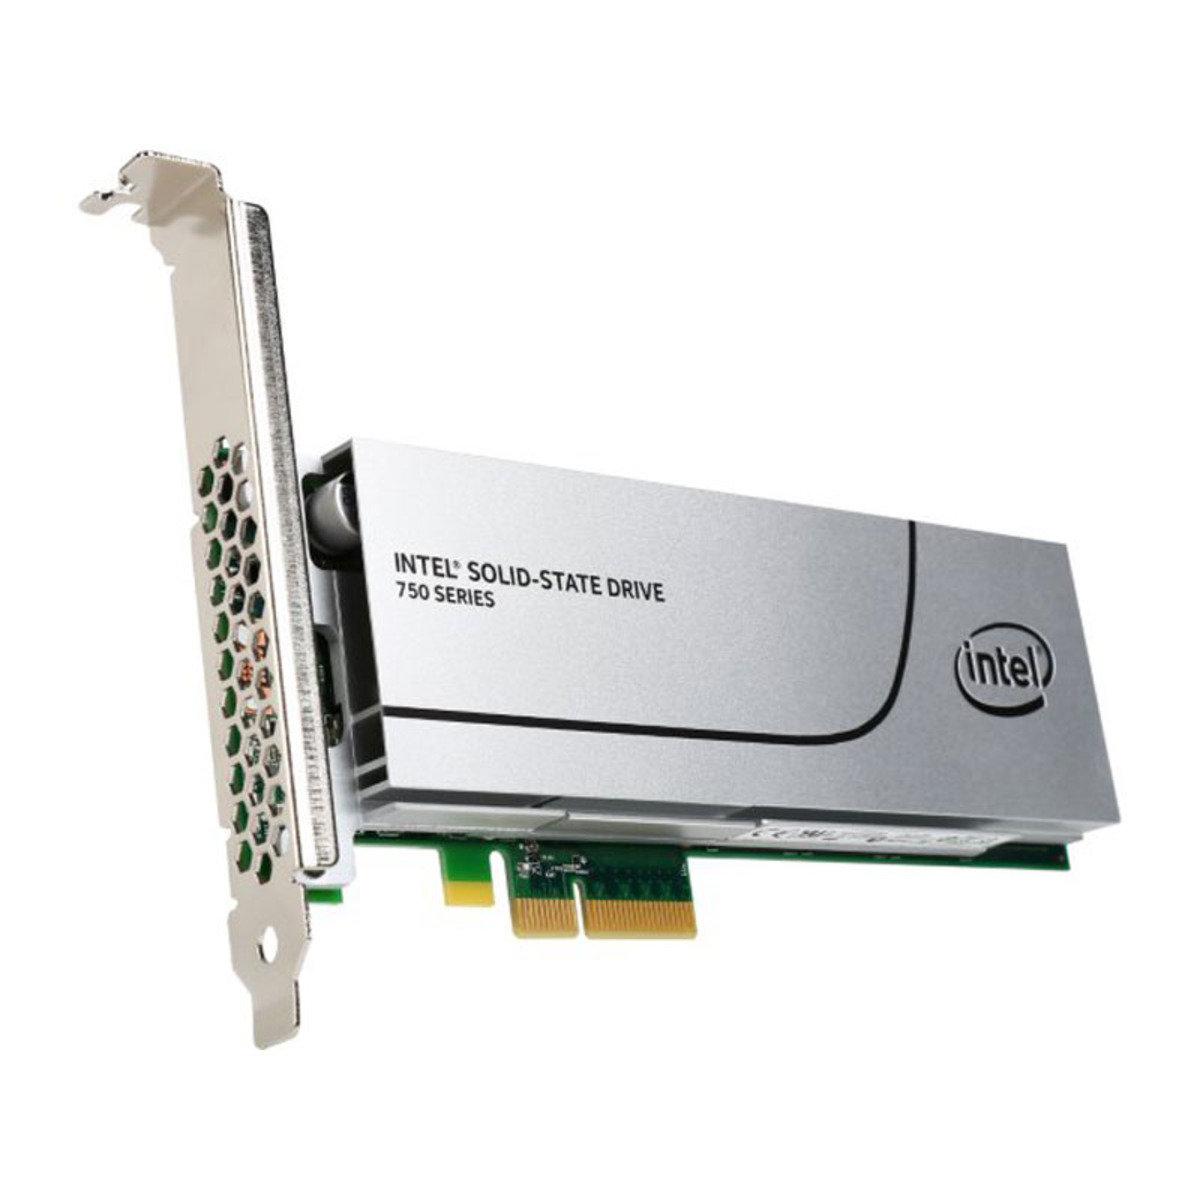 SSD 超高速NVMe內置固態硬碟 750系列AIC 400GB